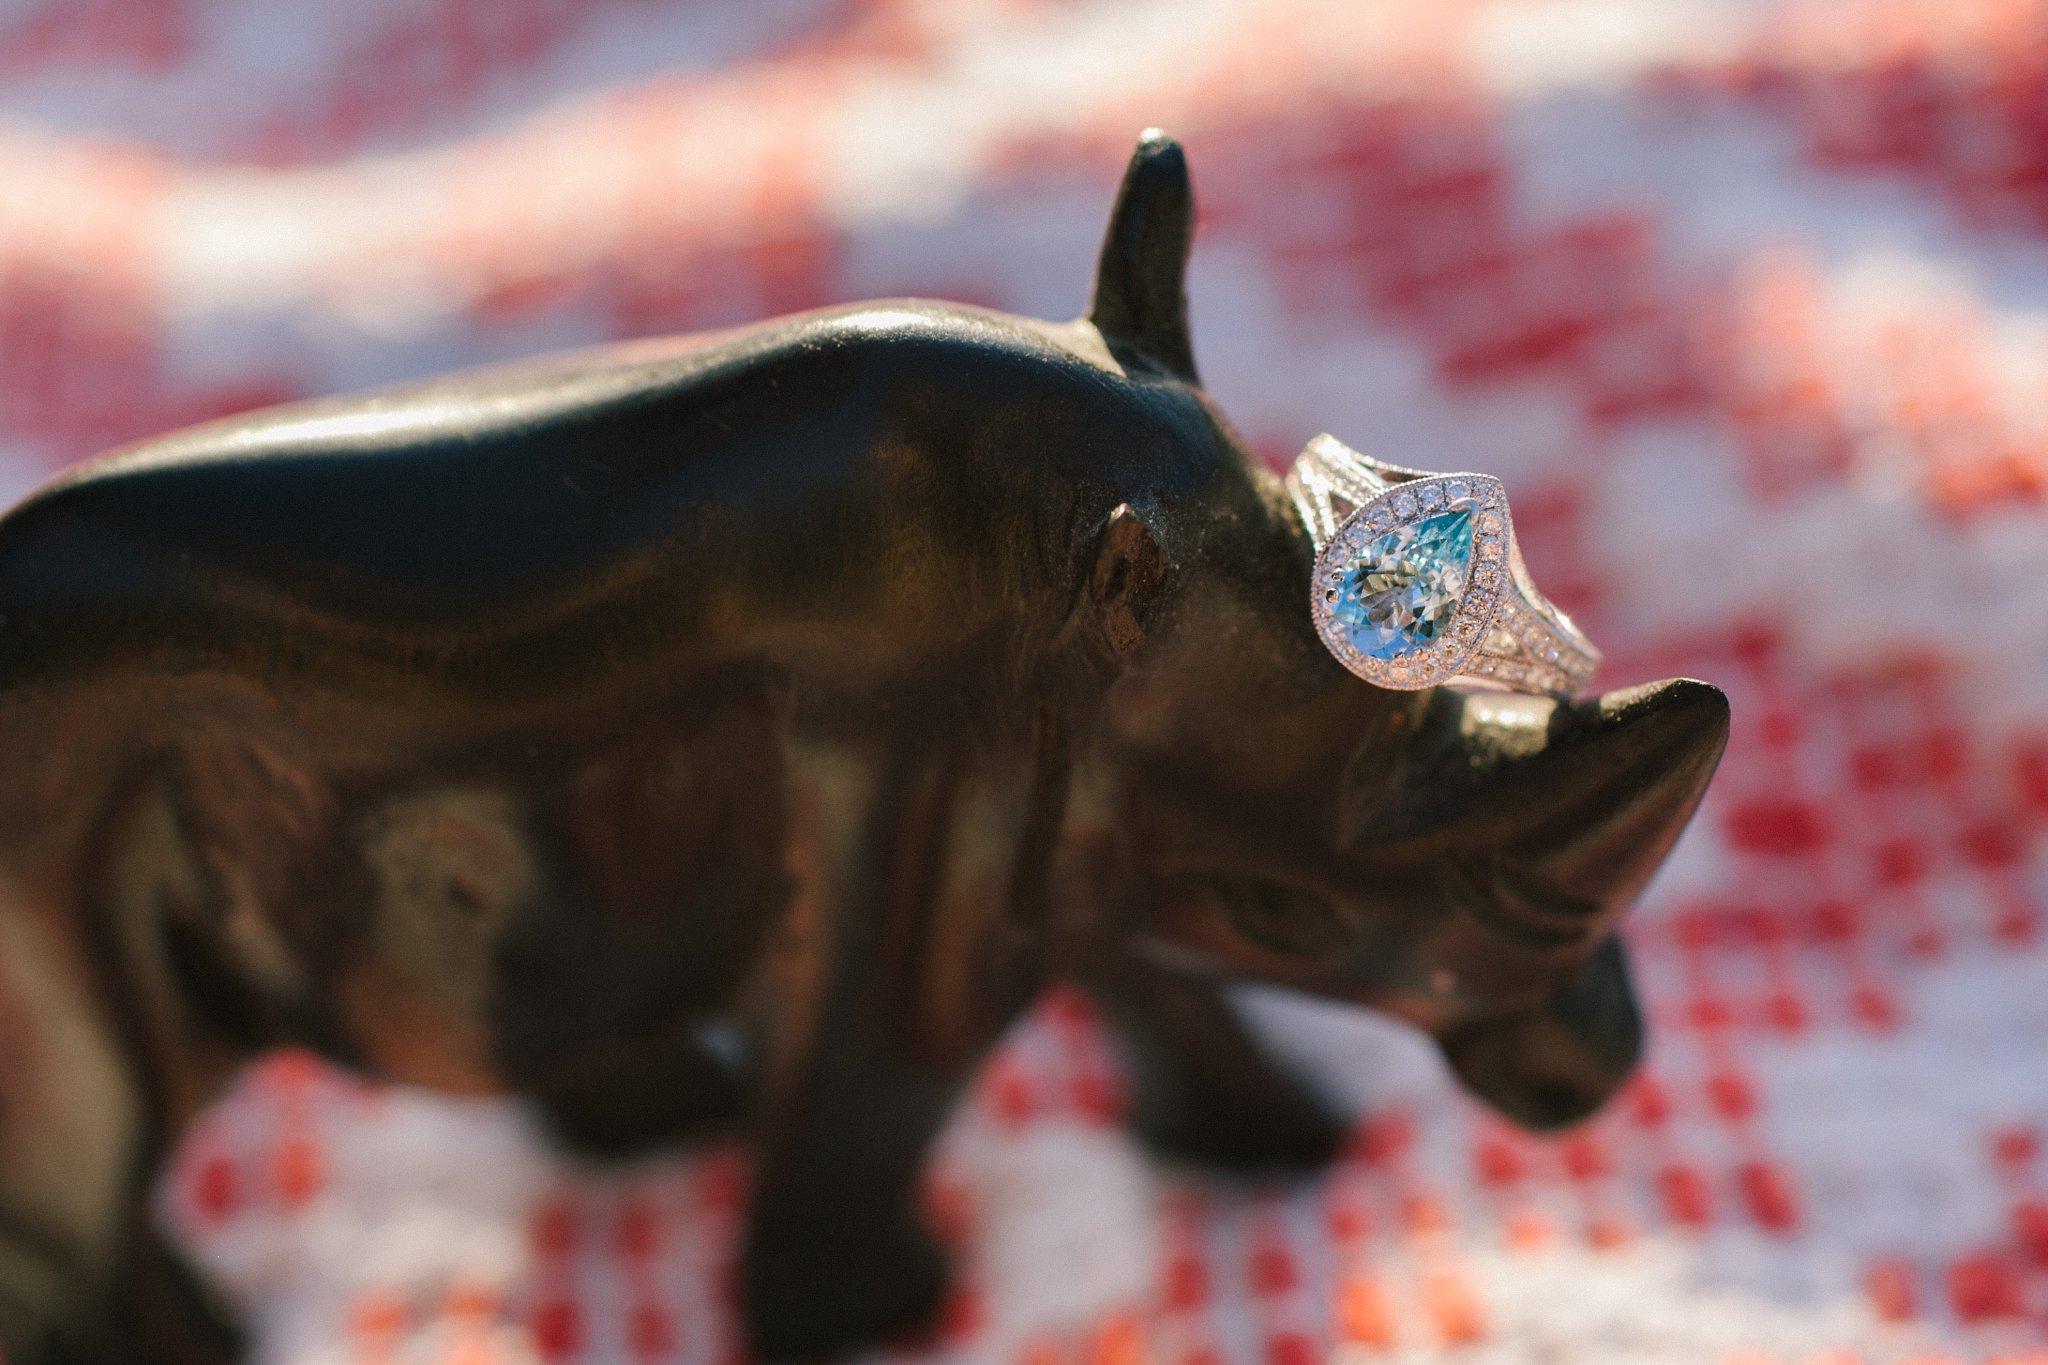 blue topaz pear cut engagement ring Arizona wedding photographer